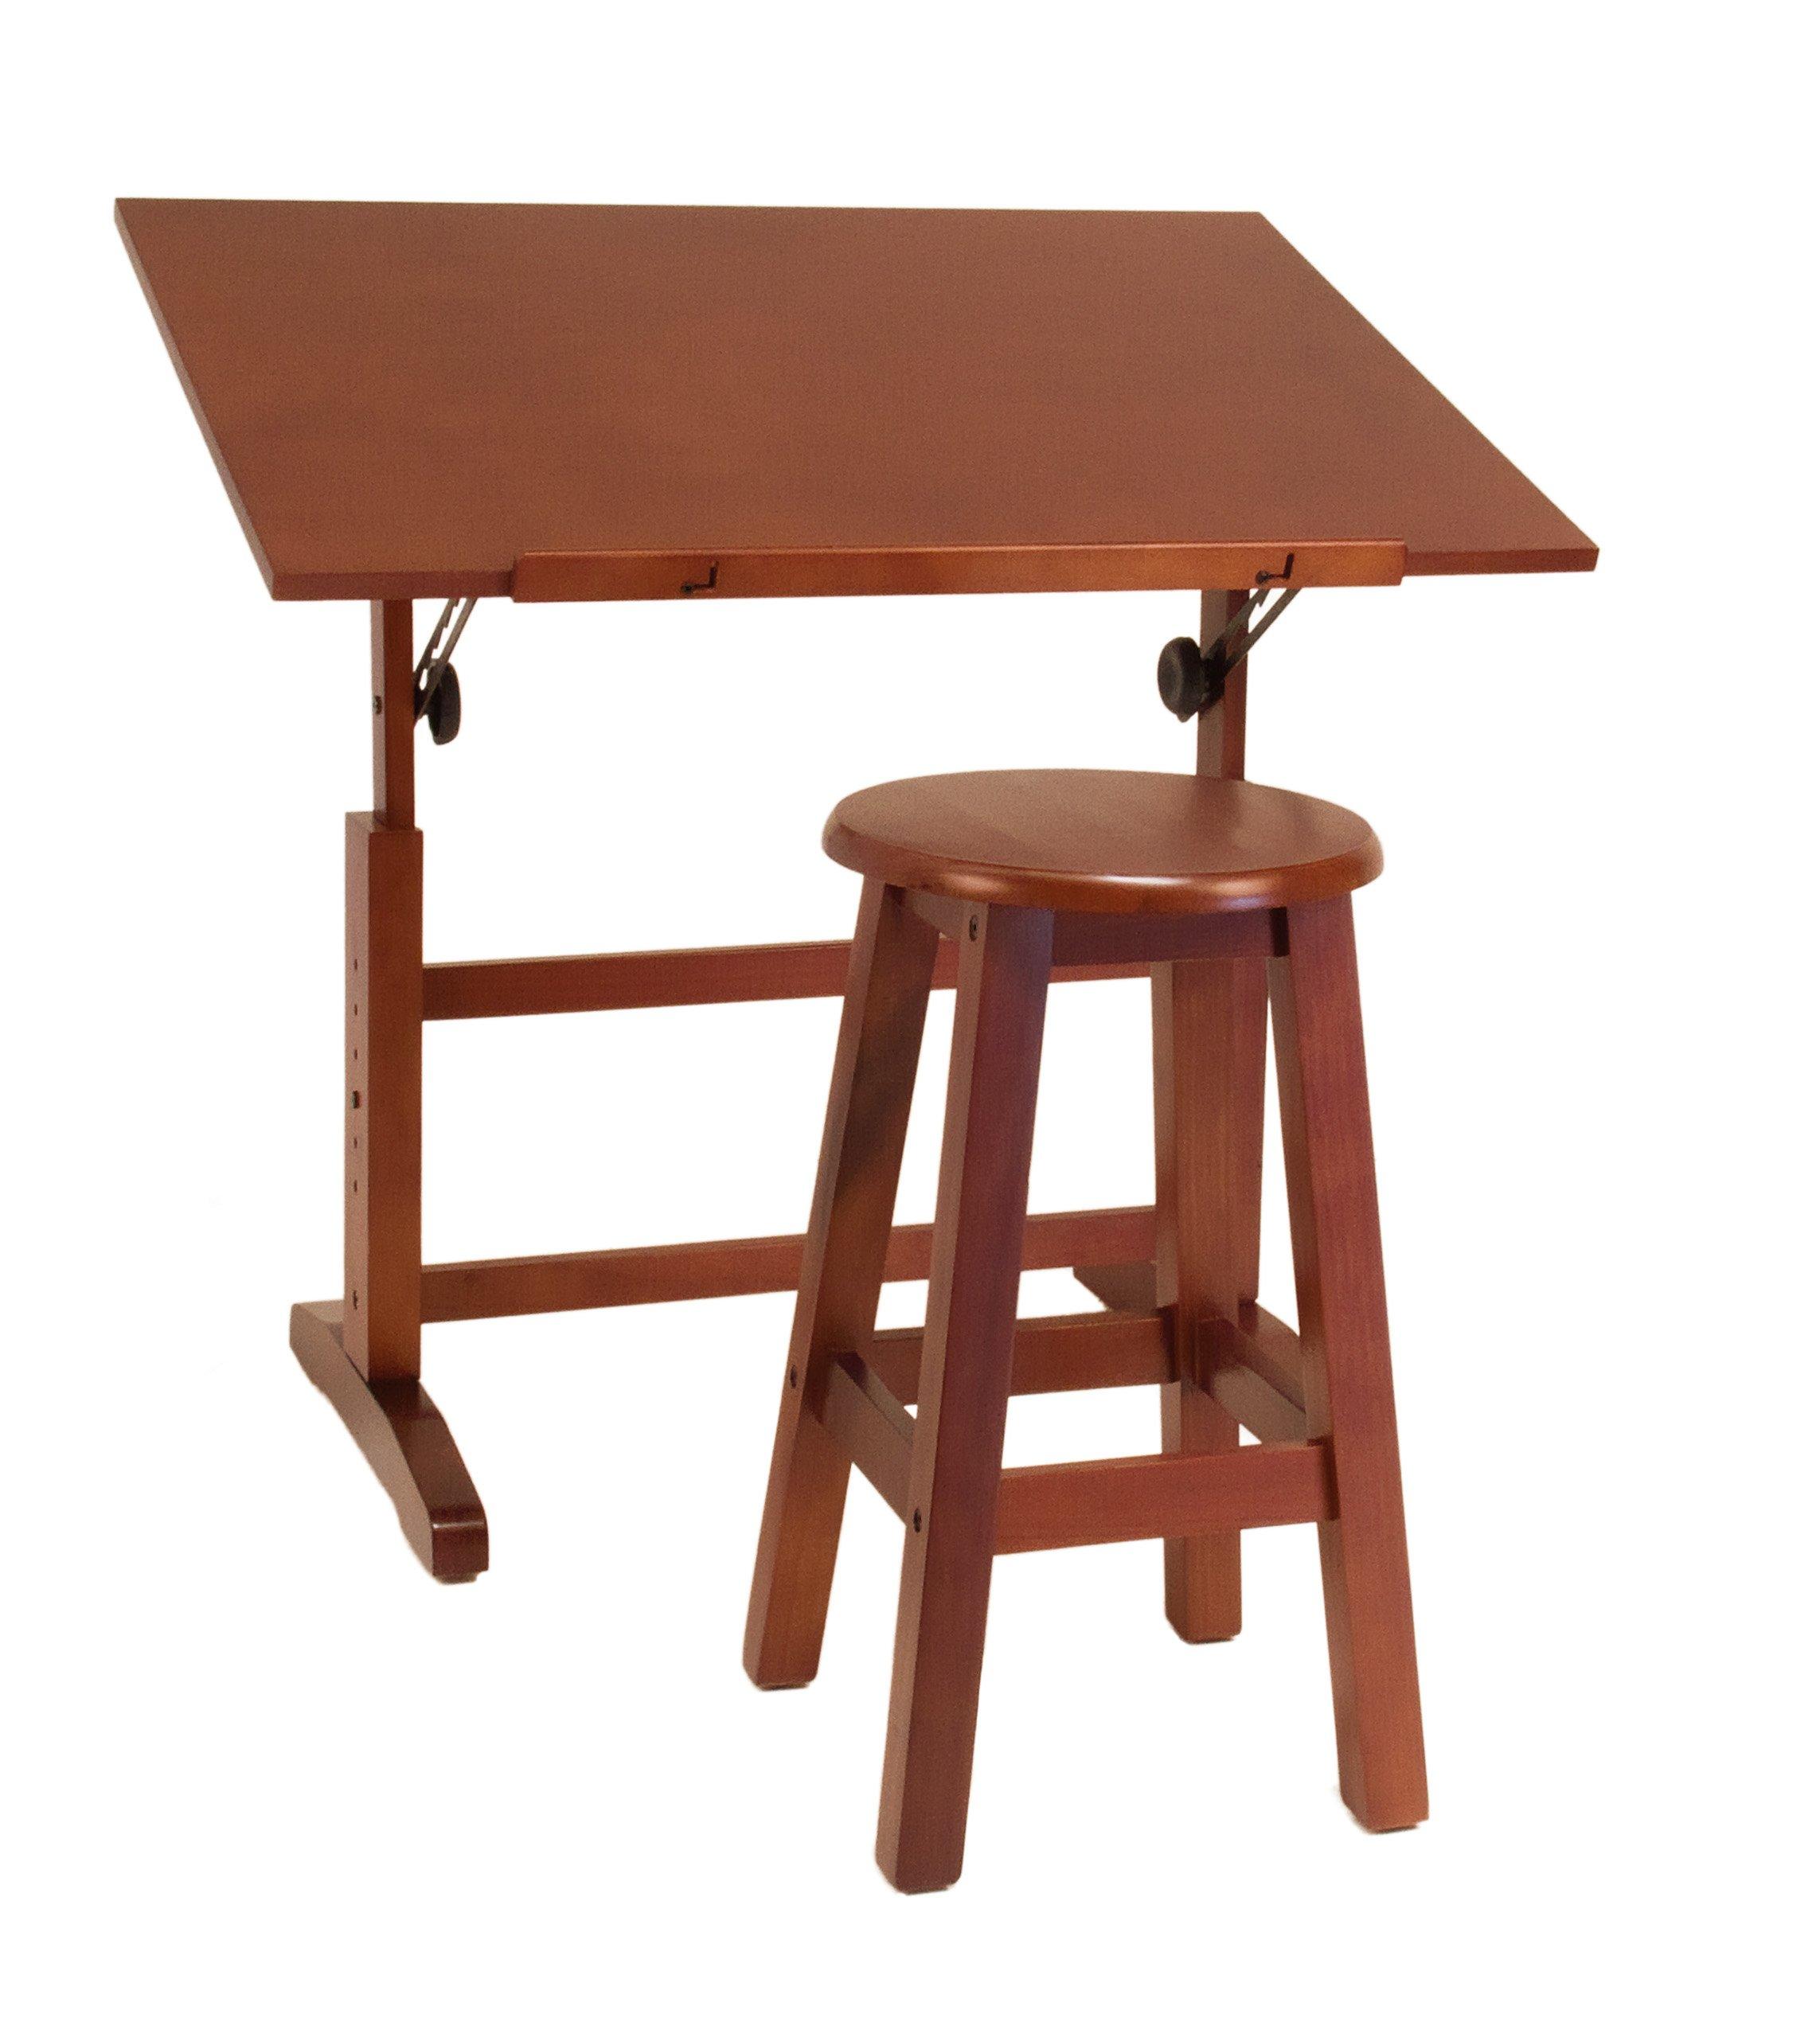 Studio Designs 13257 Creative Table and Stool Set, Walnut by Studio Designs